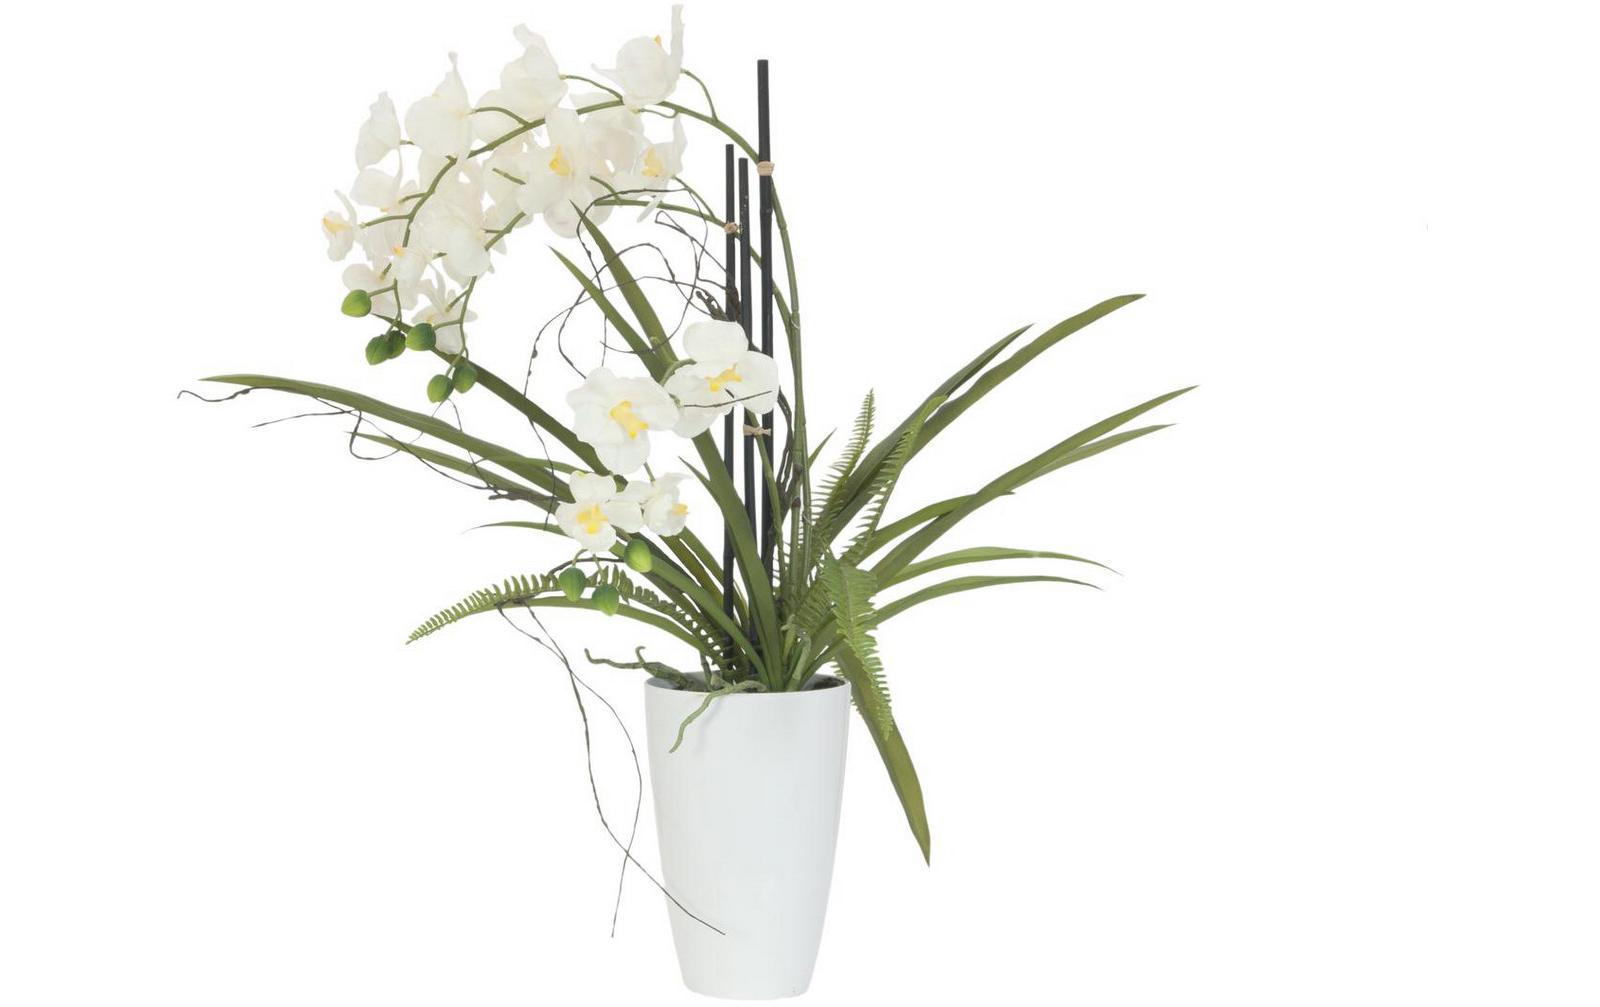 europalms-orchideen-arrangement-2-kunststoffpflanze